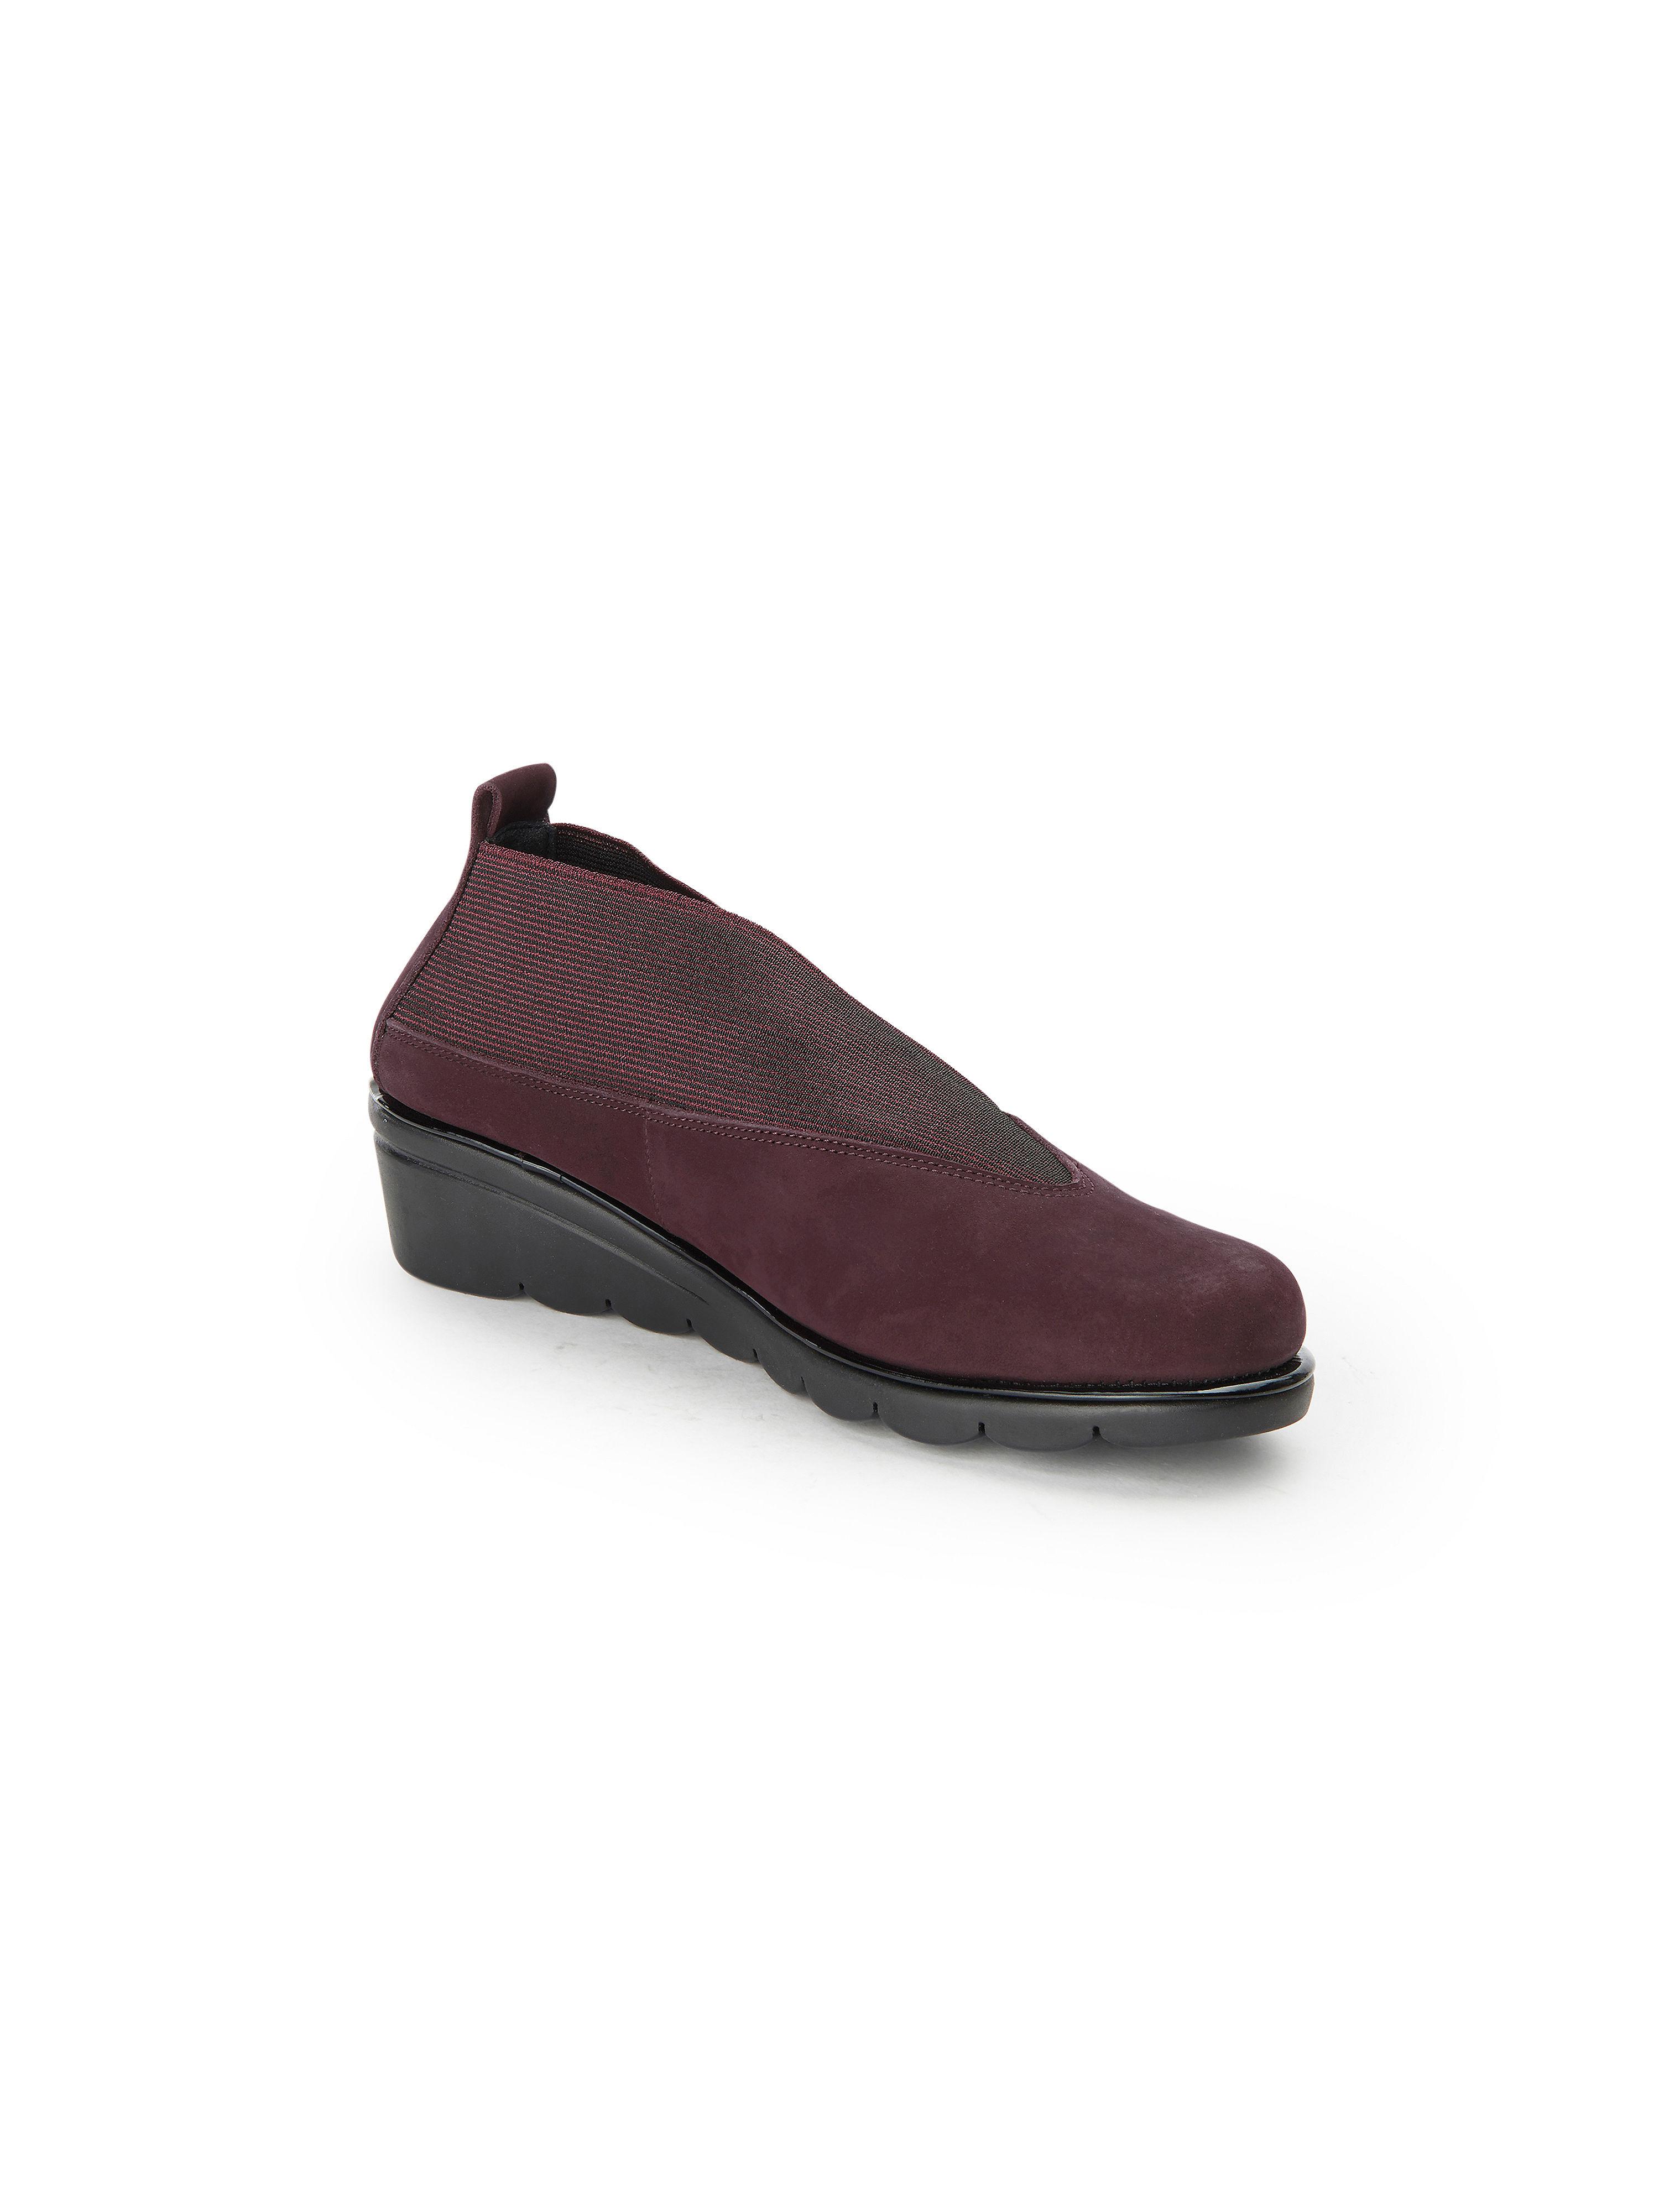 The Flexx - Halbschuh aus 100% Leder - Bordeaux Gute Qualität beliebte Schuhe